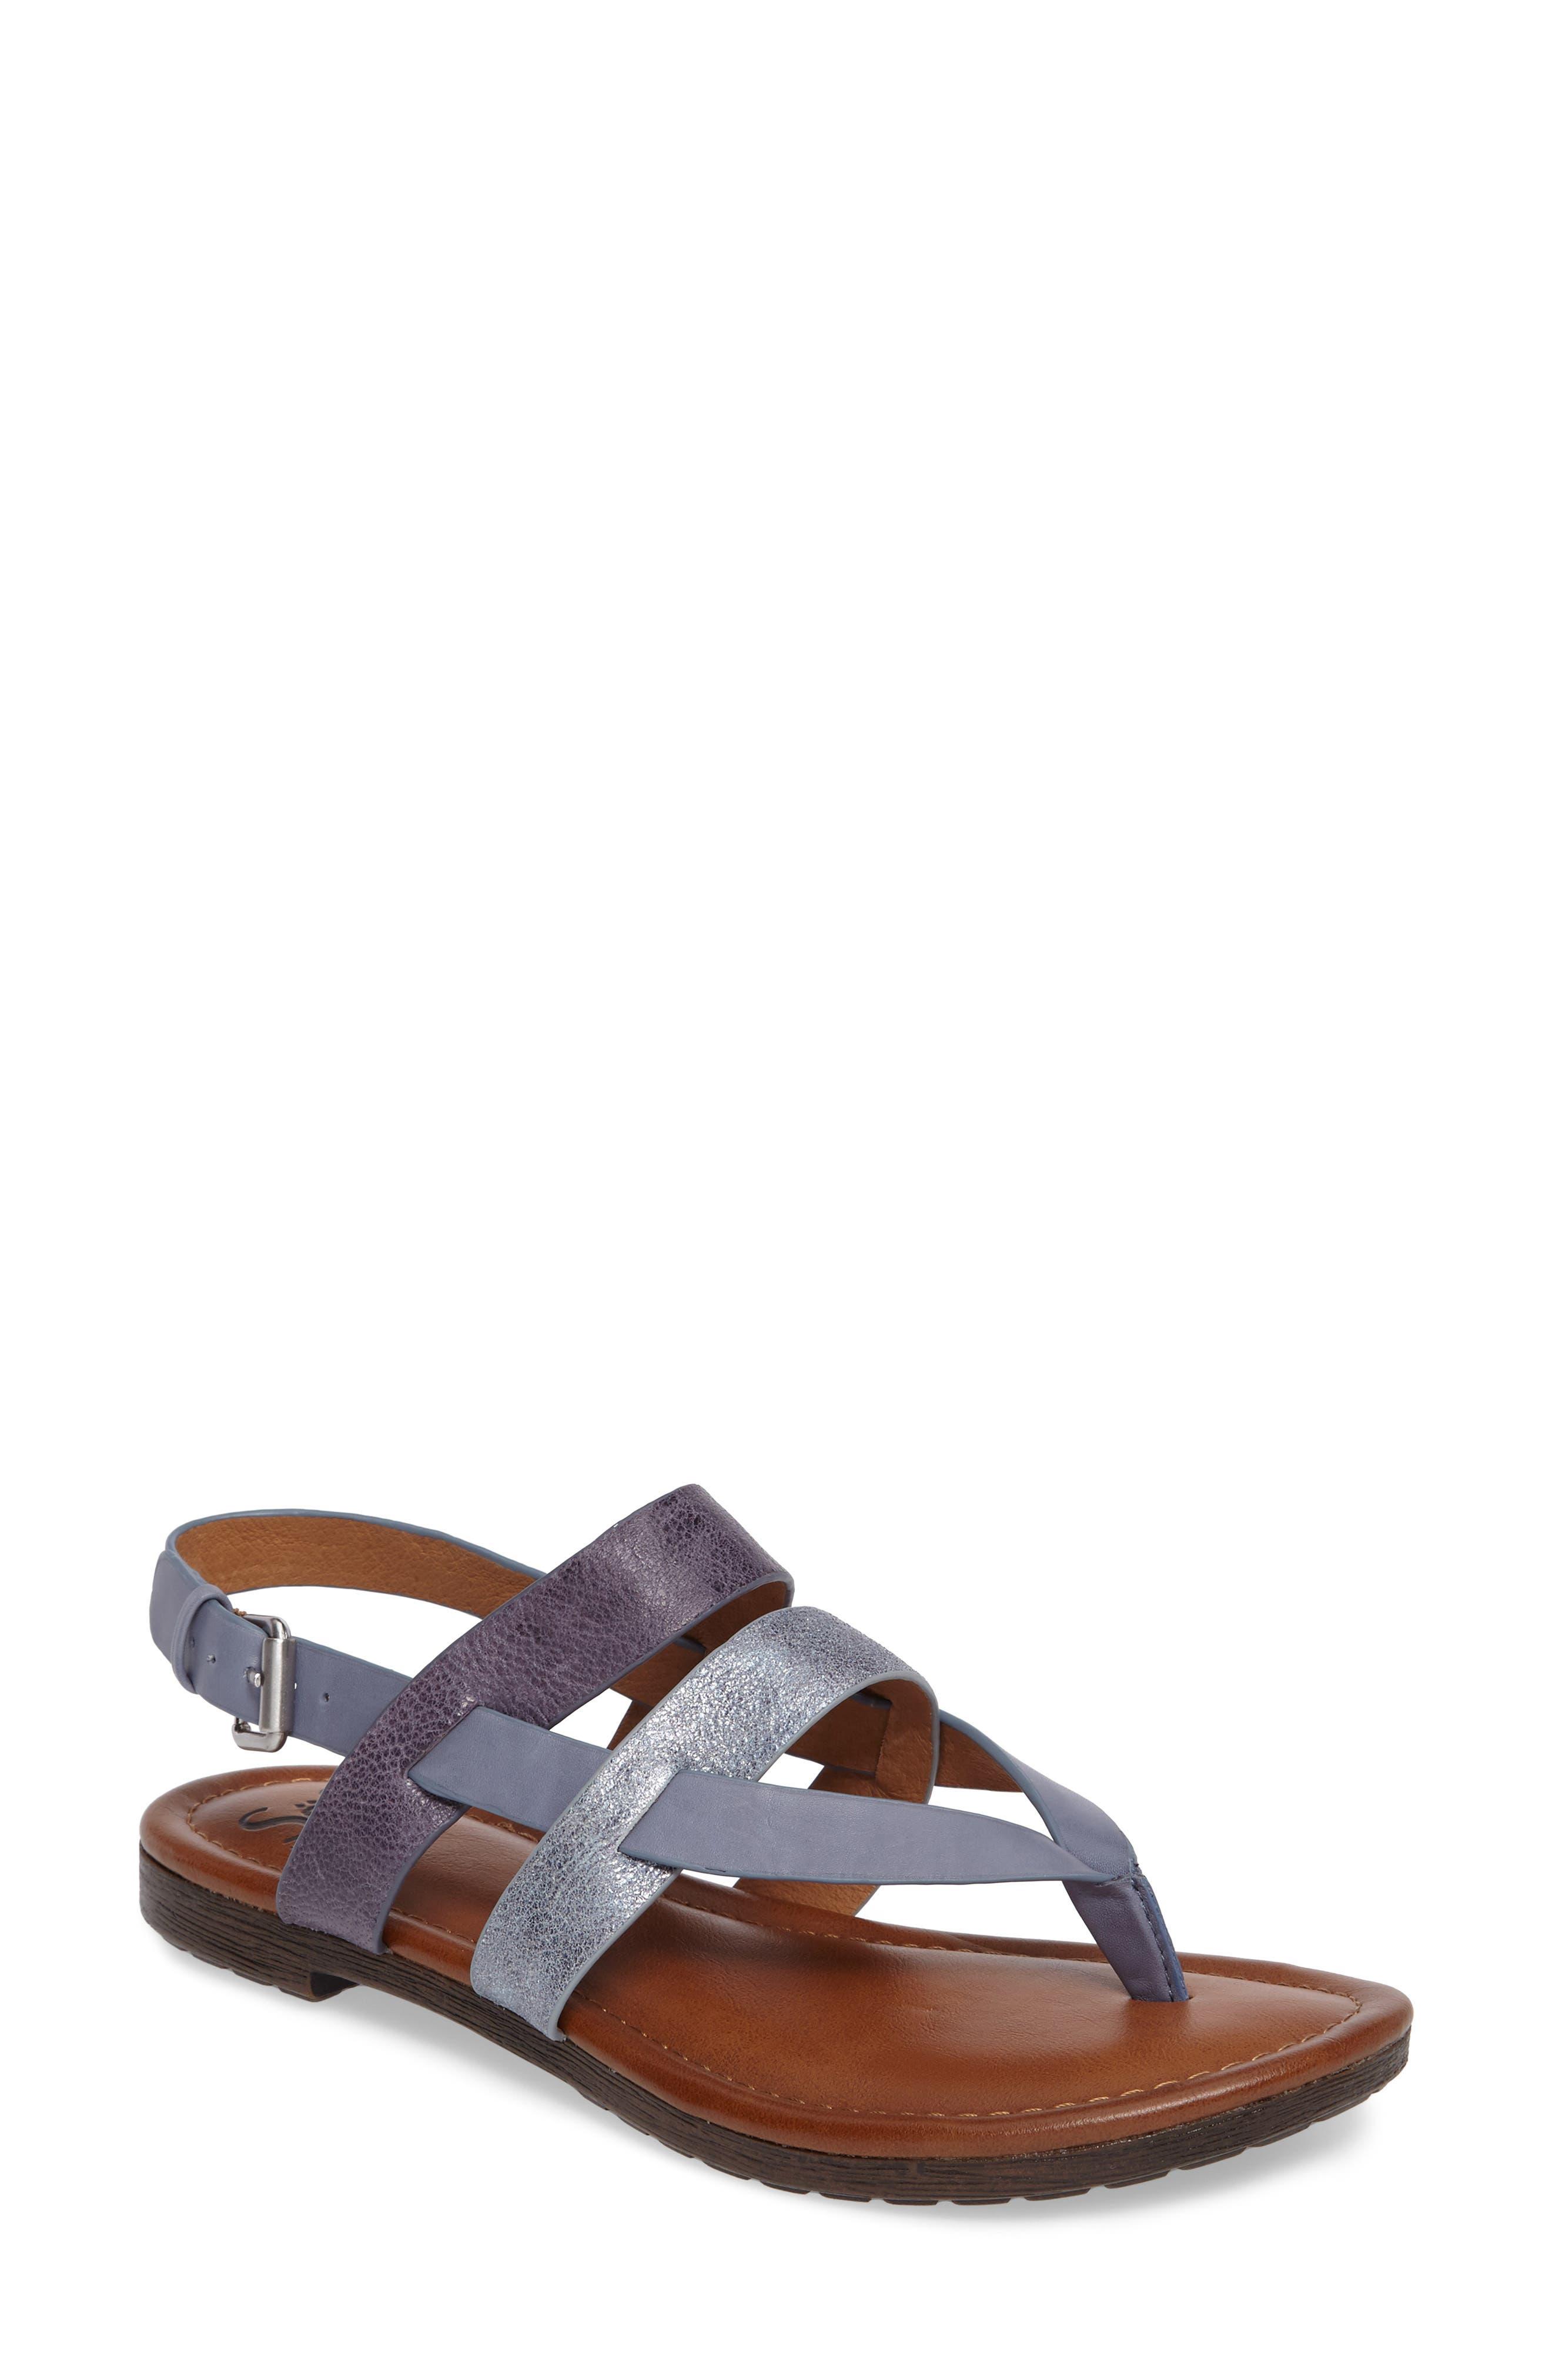 Bena Strappy Sandal,                         Main,                         color, Denim/ Blue/ Pale Blue Leather